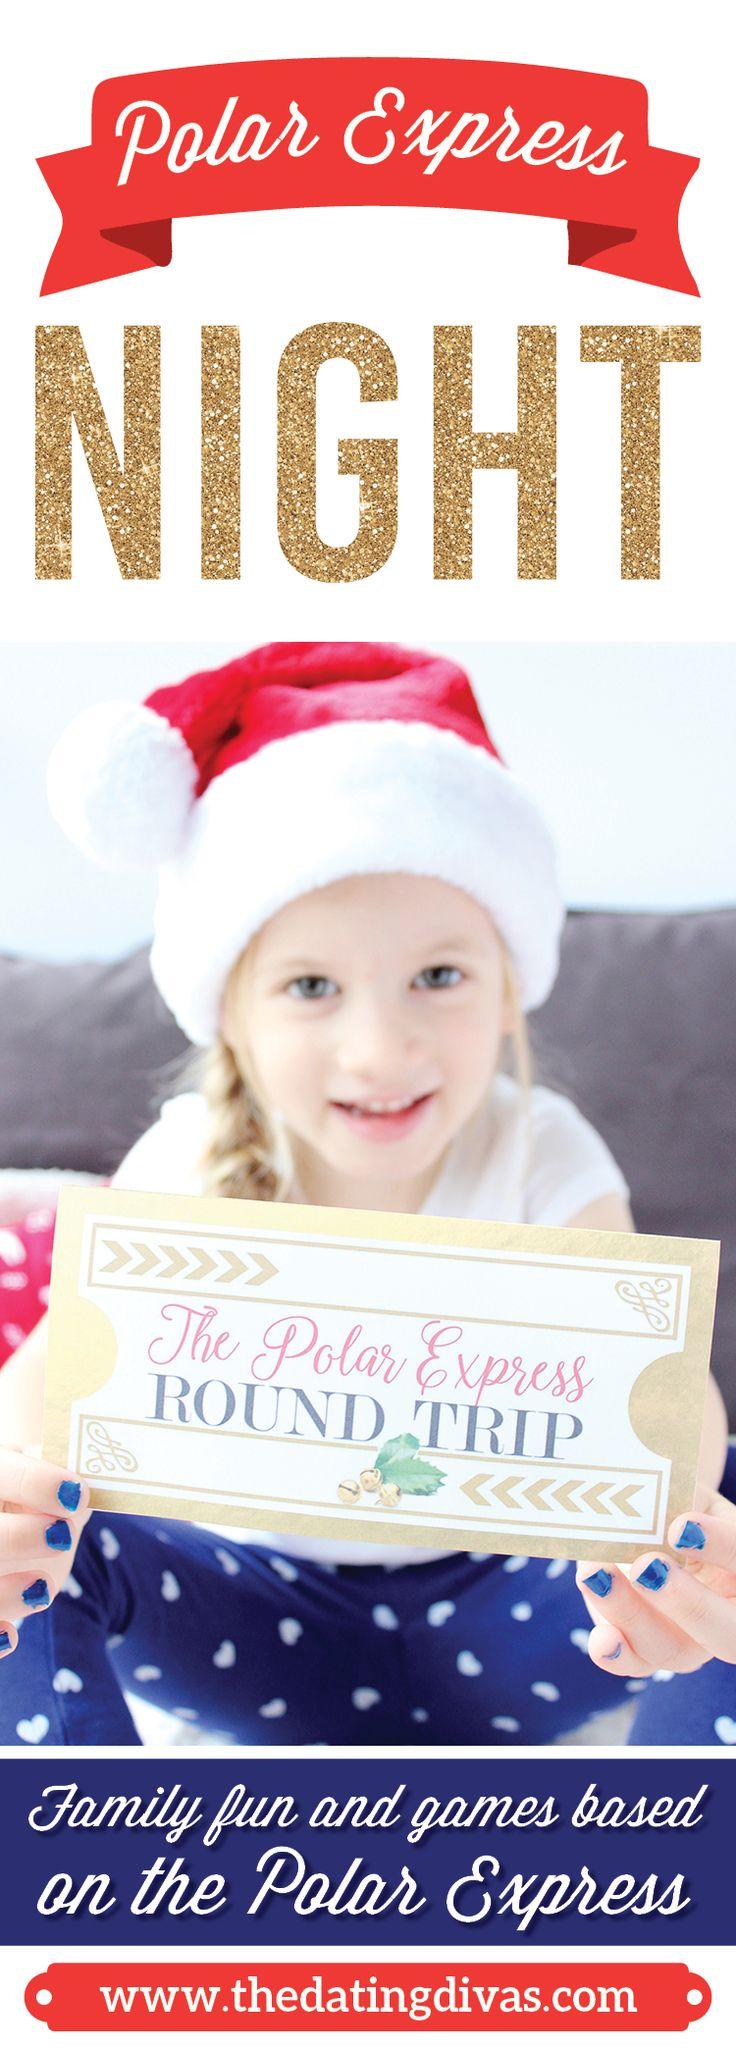 Free Printables for a fun Polar Express Family Night!  Such a fun way to make magical Christmas memories.